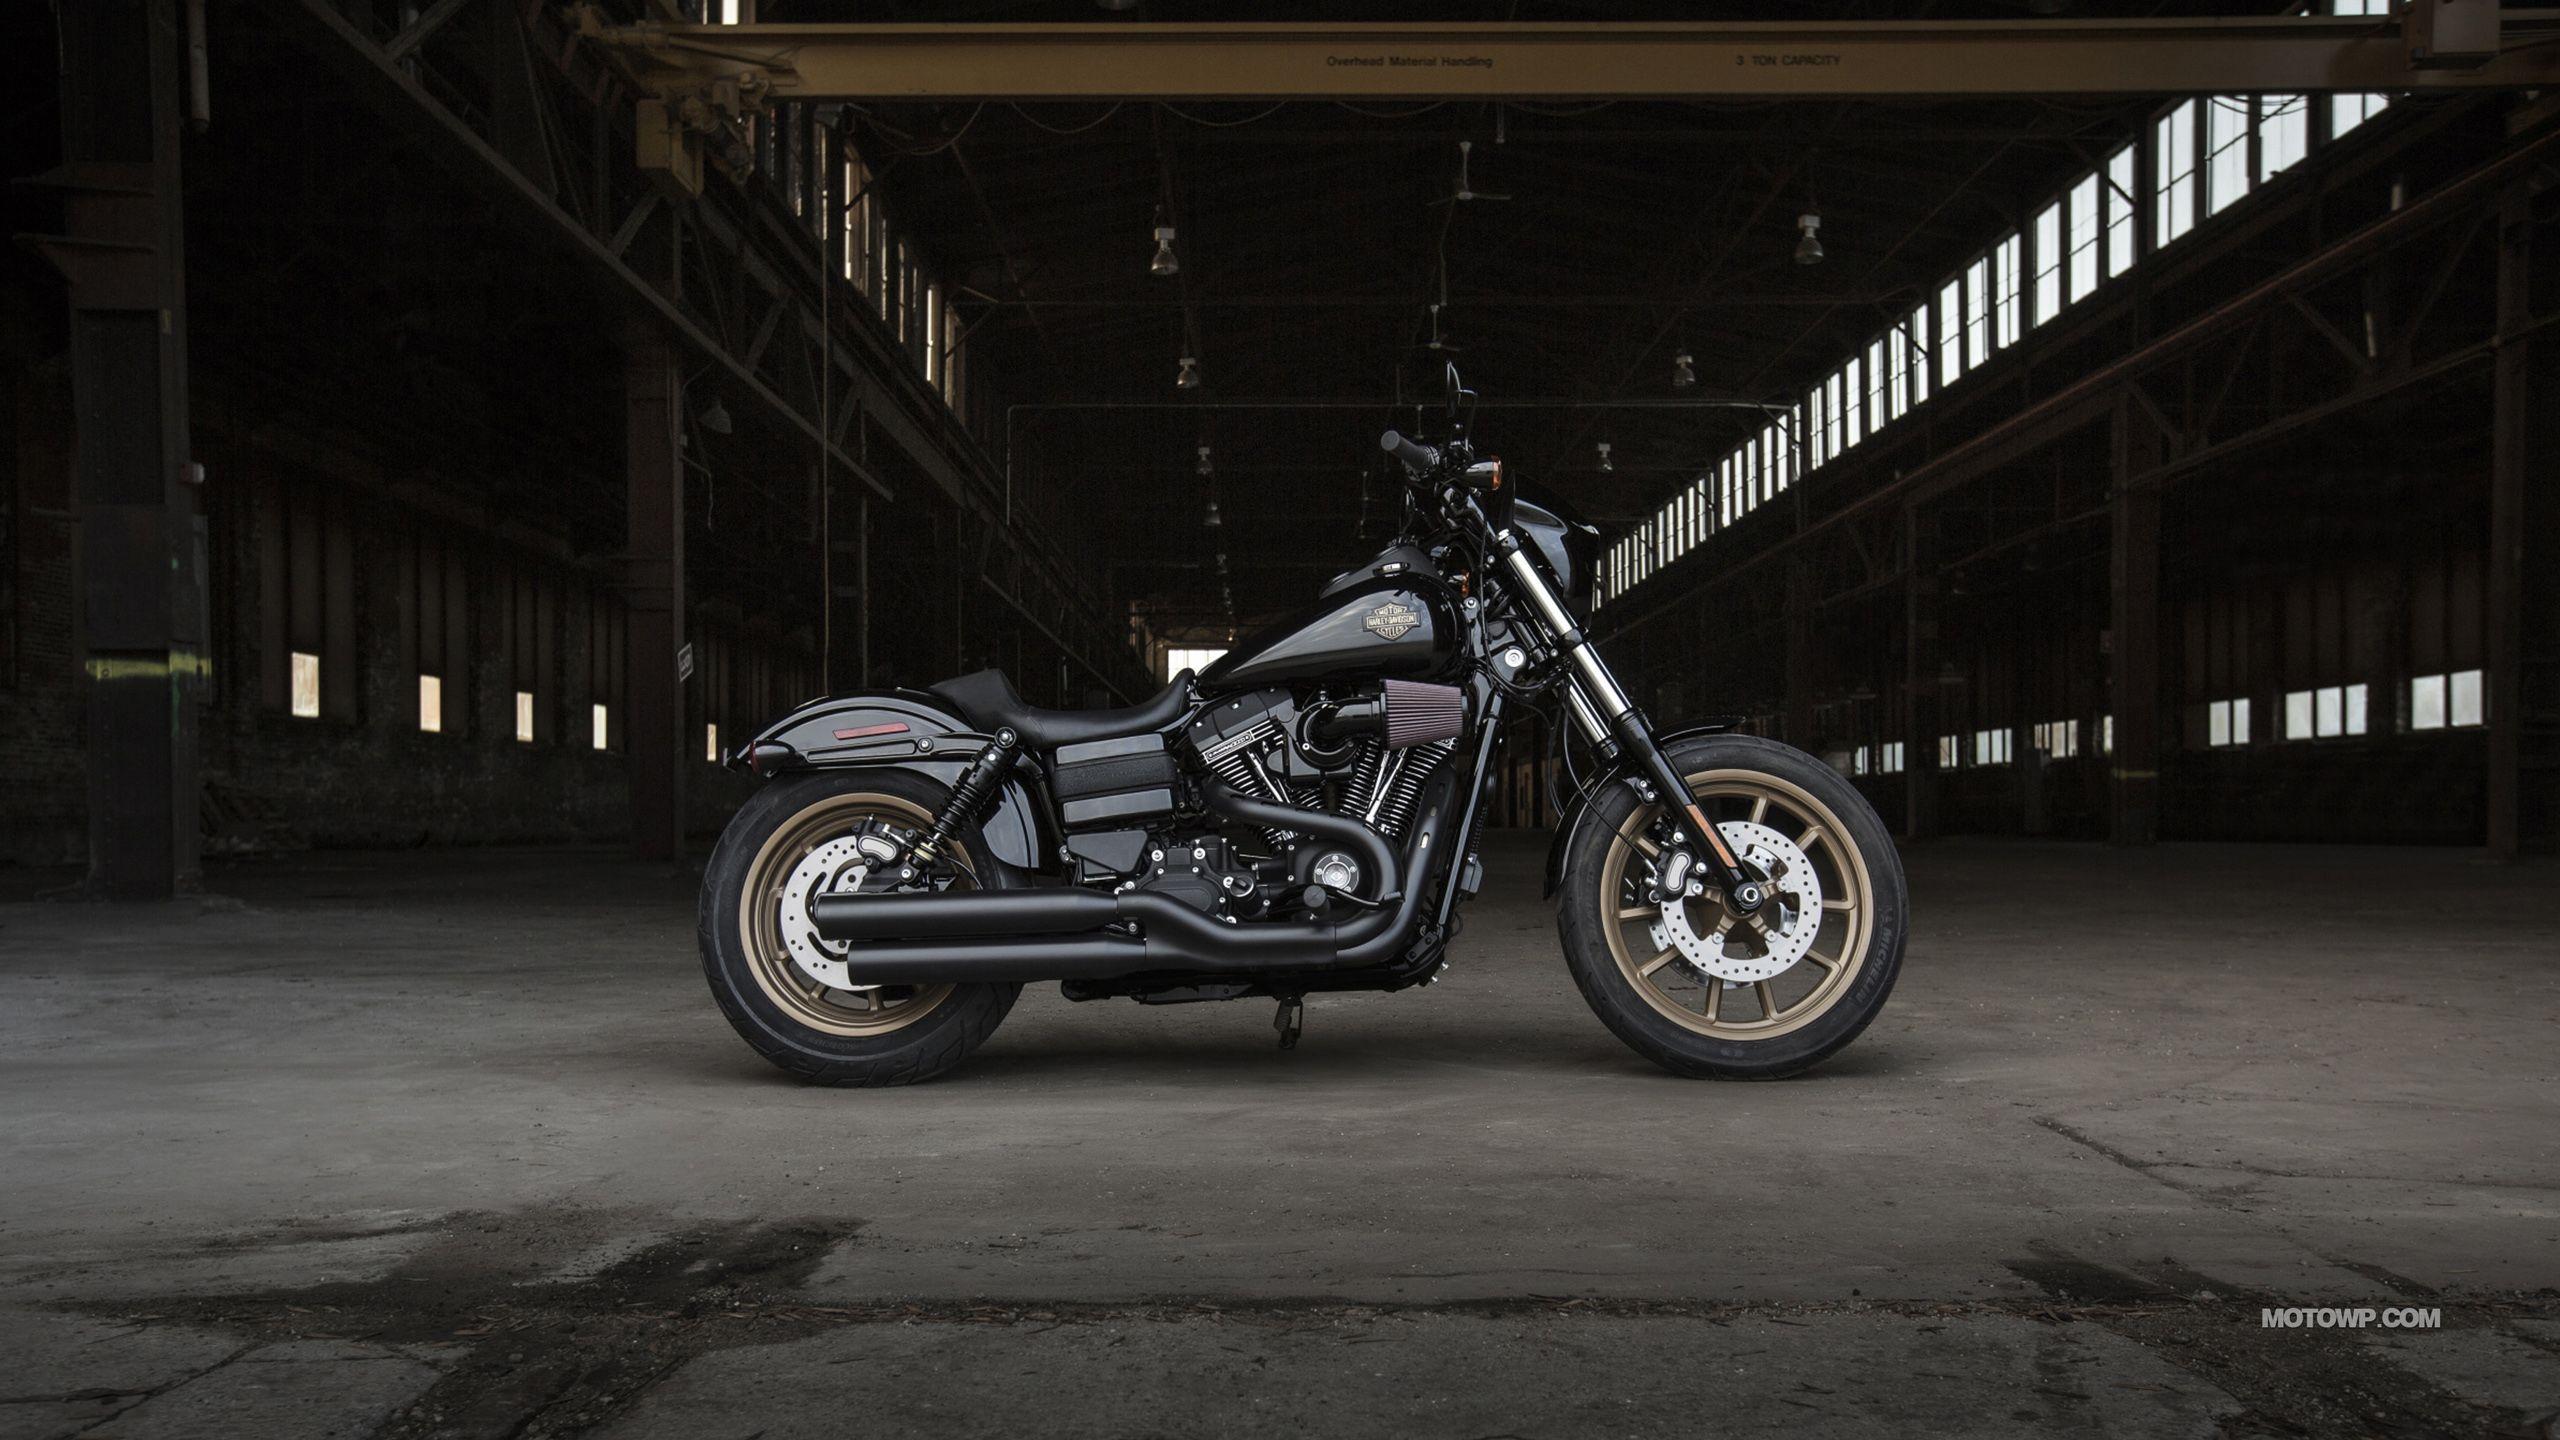 Harley-Davidson Dyna Wallpapers